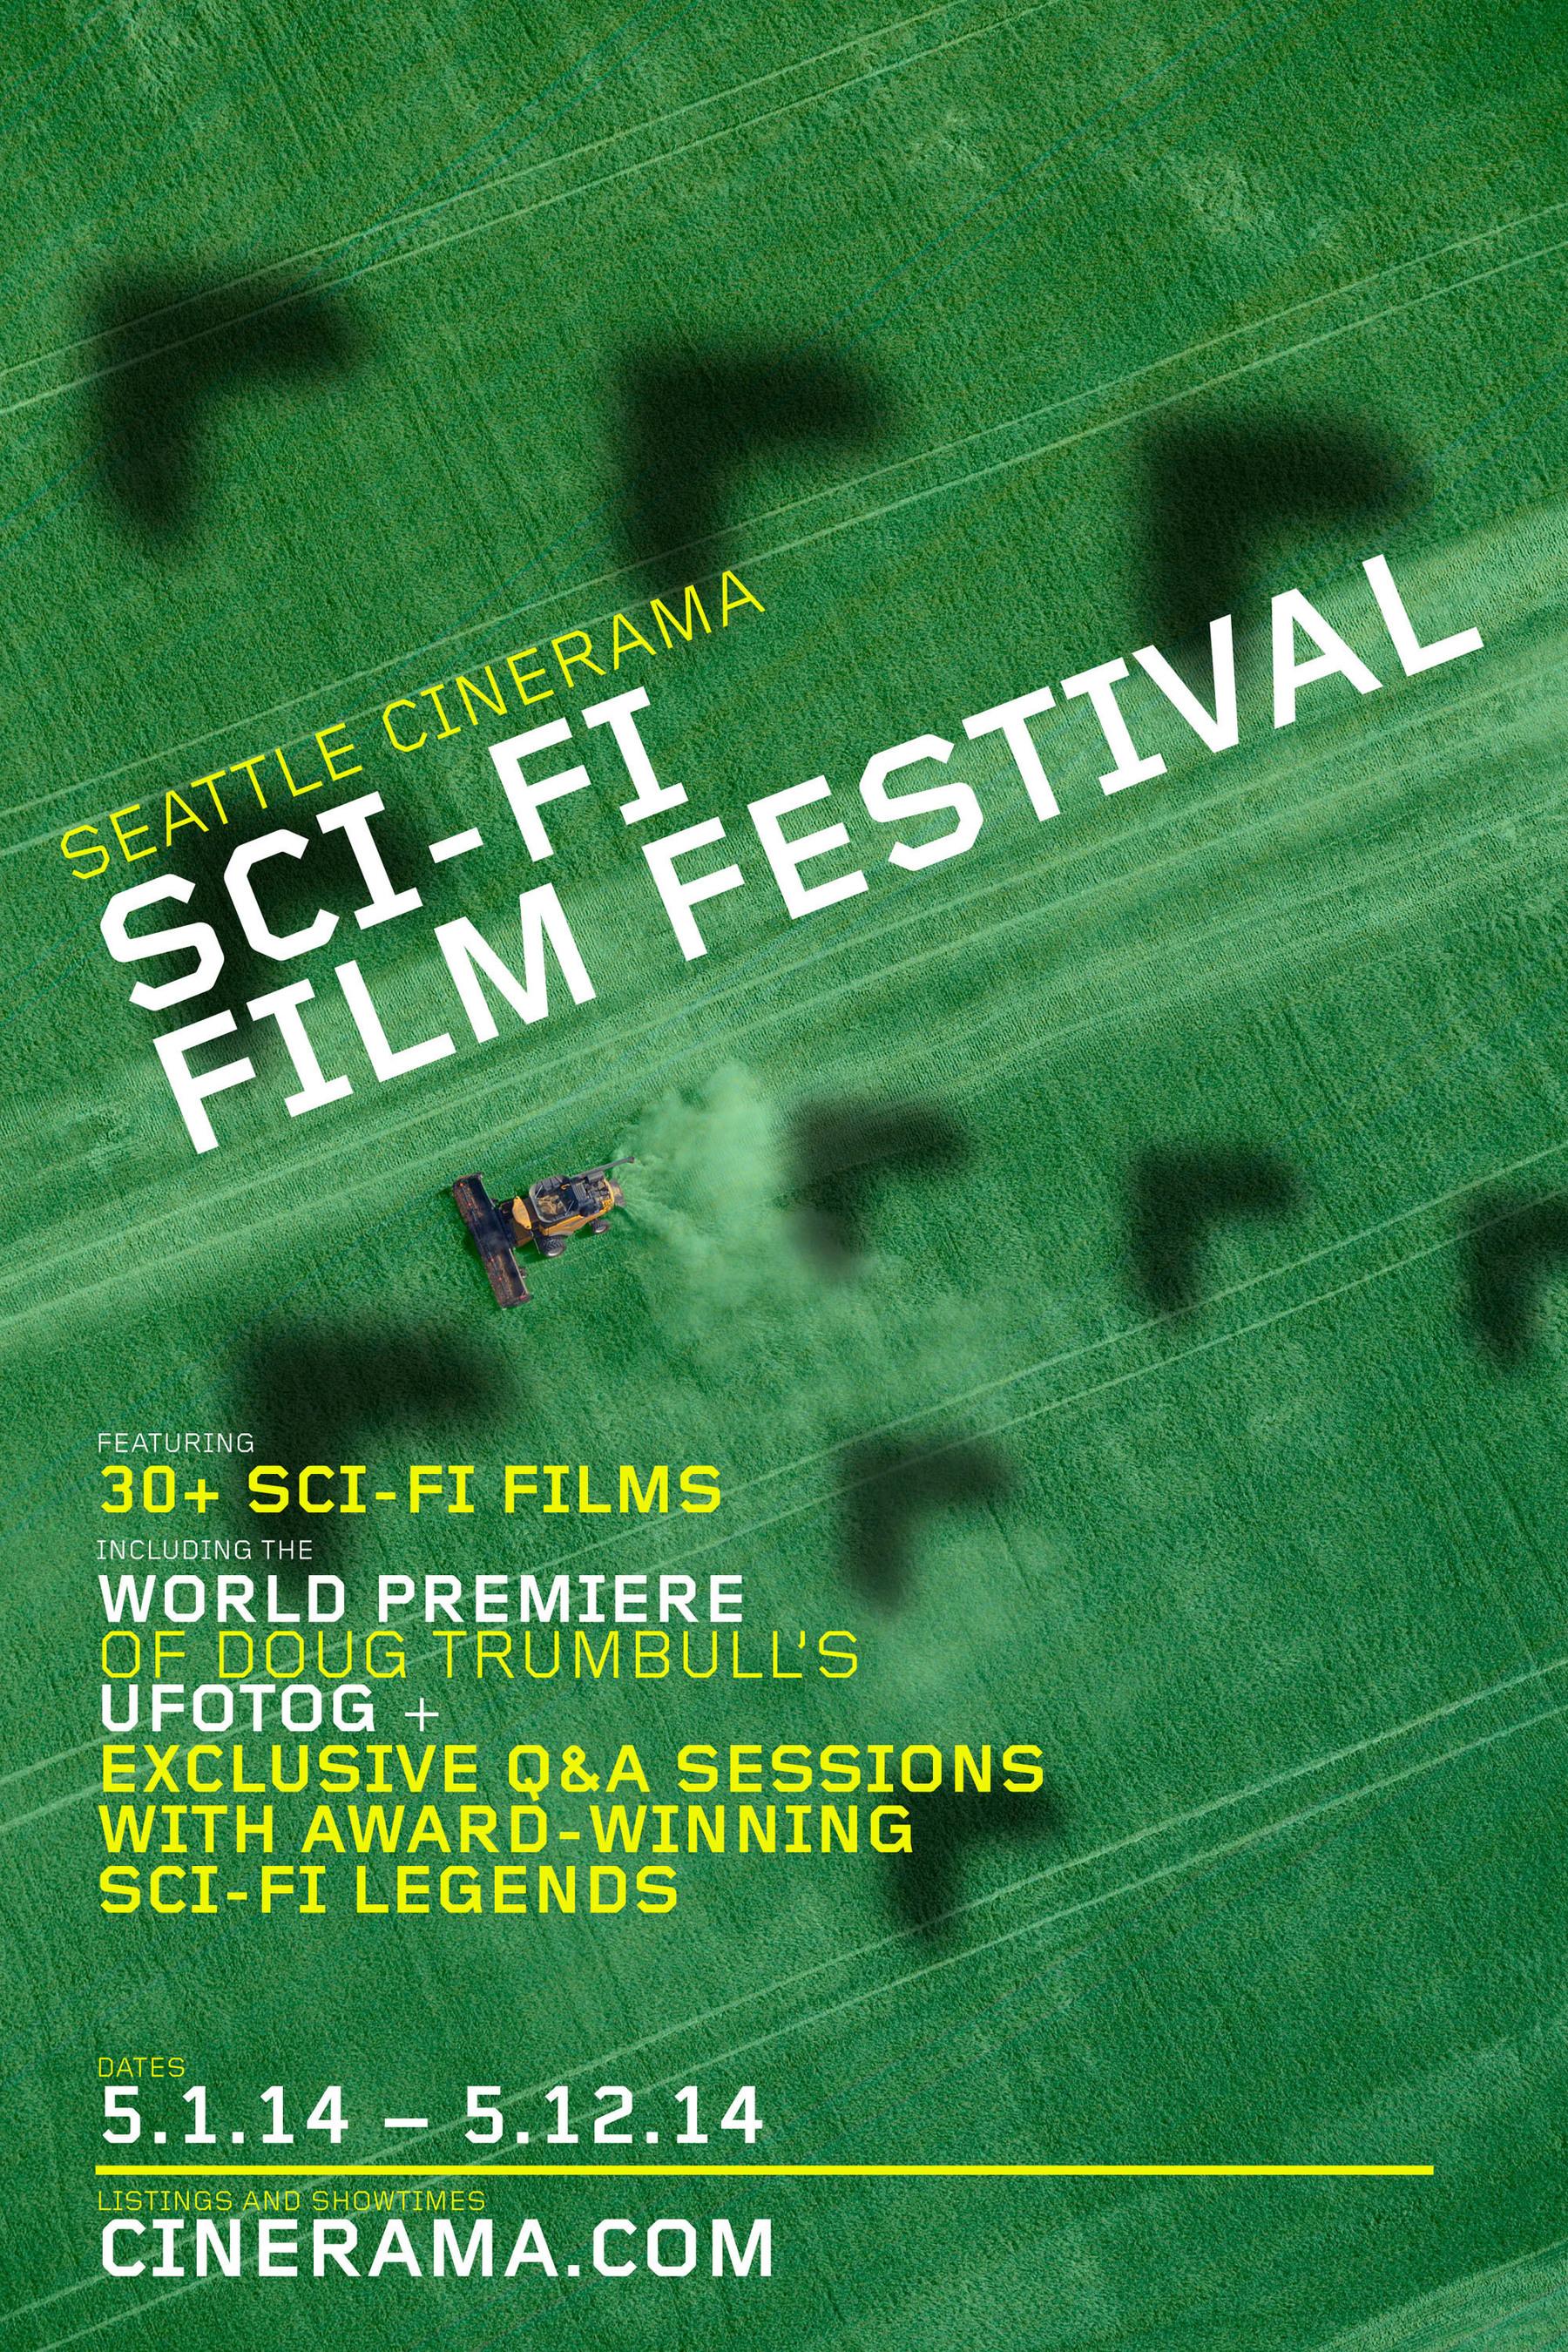 Seattle Cinerama Sci-Fi Film Festival including world premiere of UFOTOG. (PRNewsFoto/Seattle Cinerama Theater) (PRNewsFoto/SEATTLE CINERAMA THEATER)